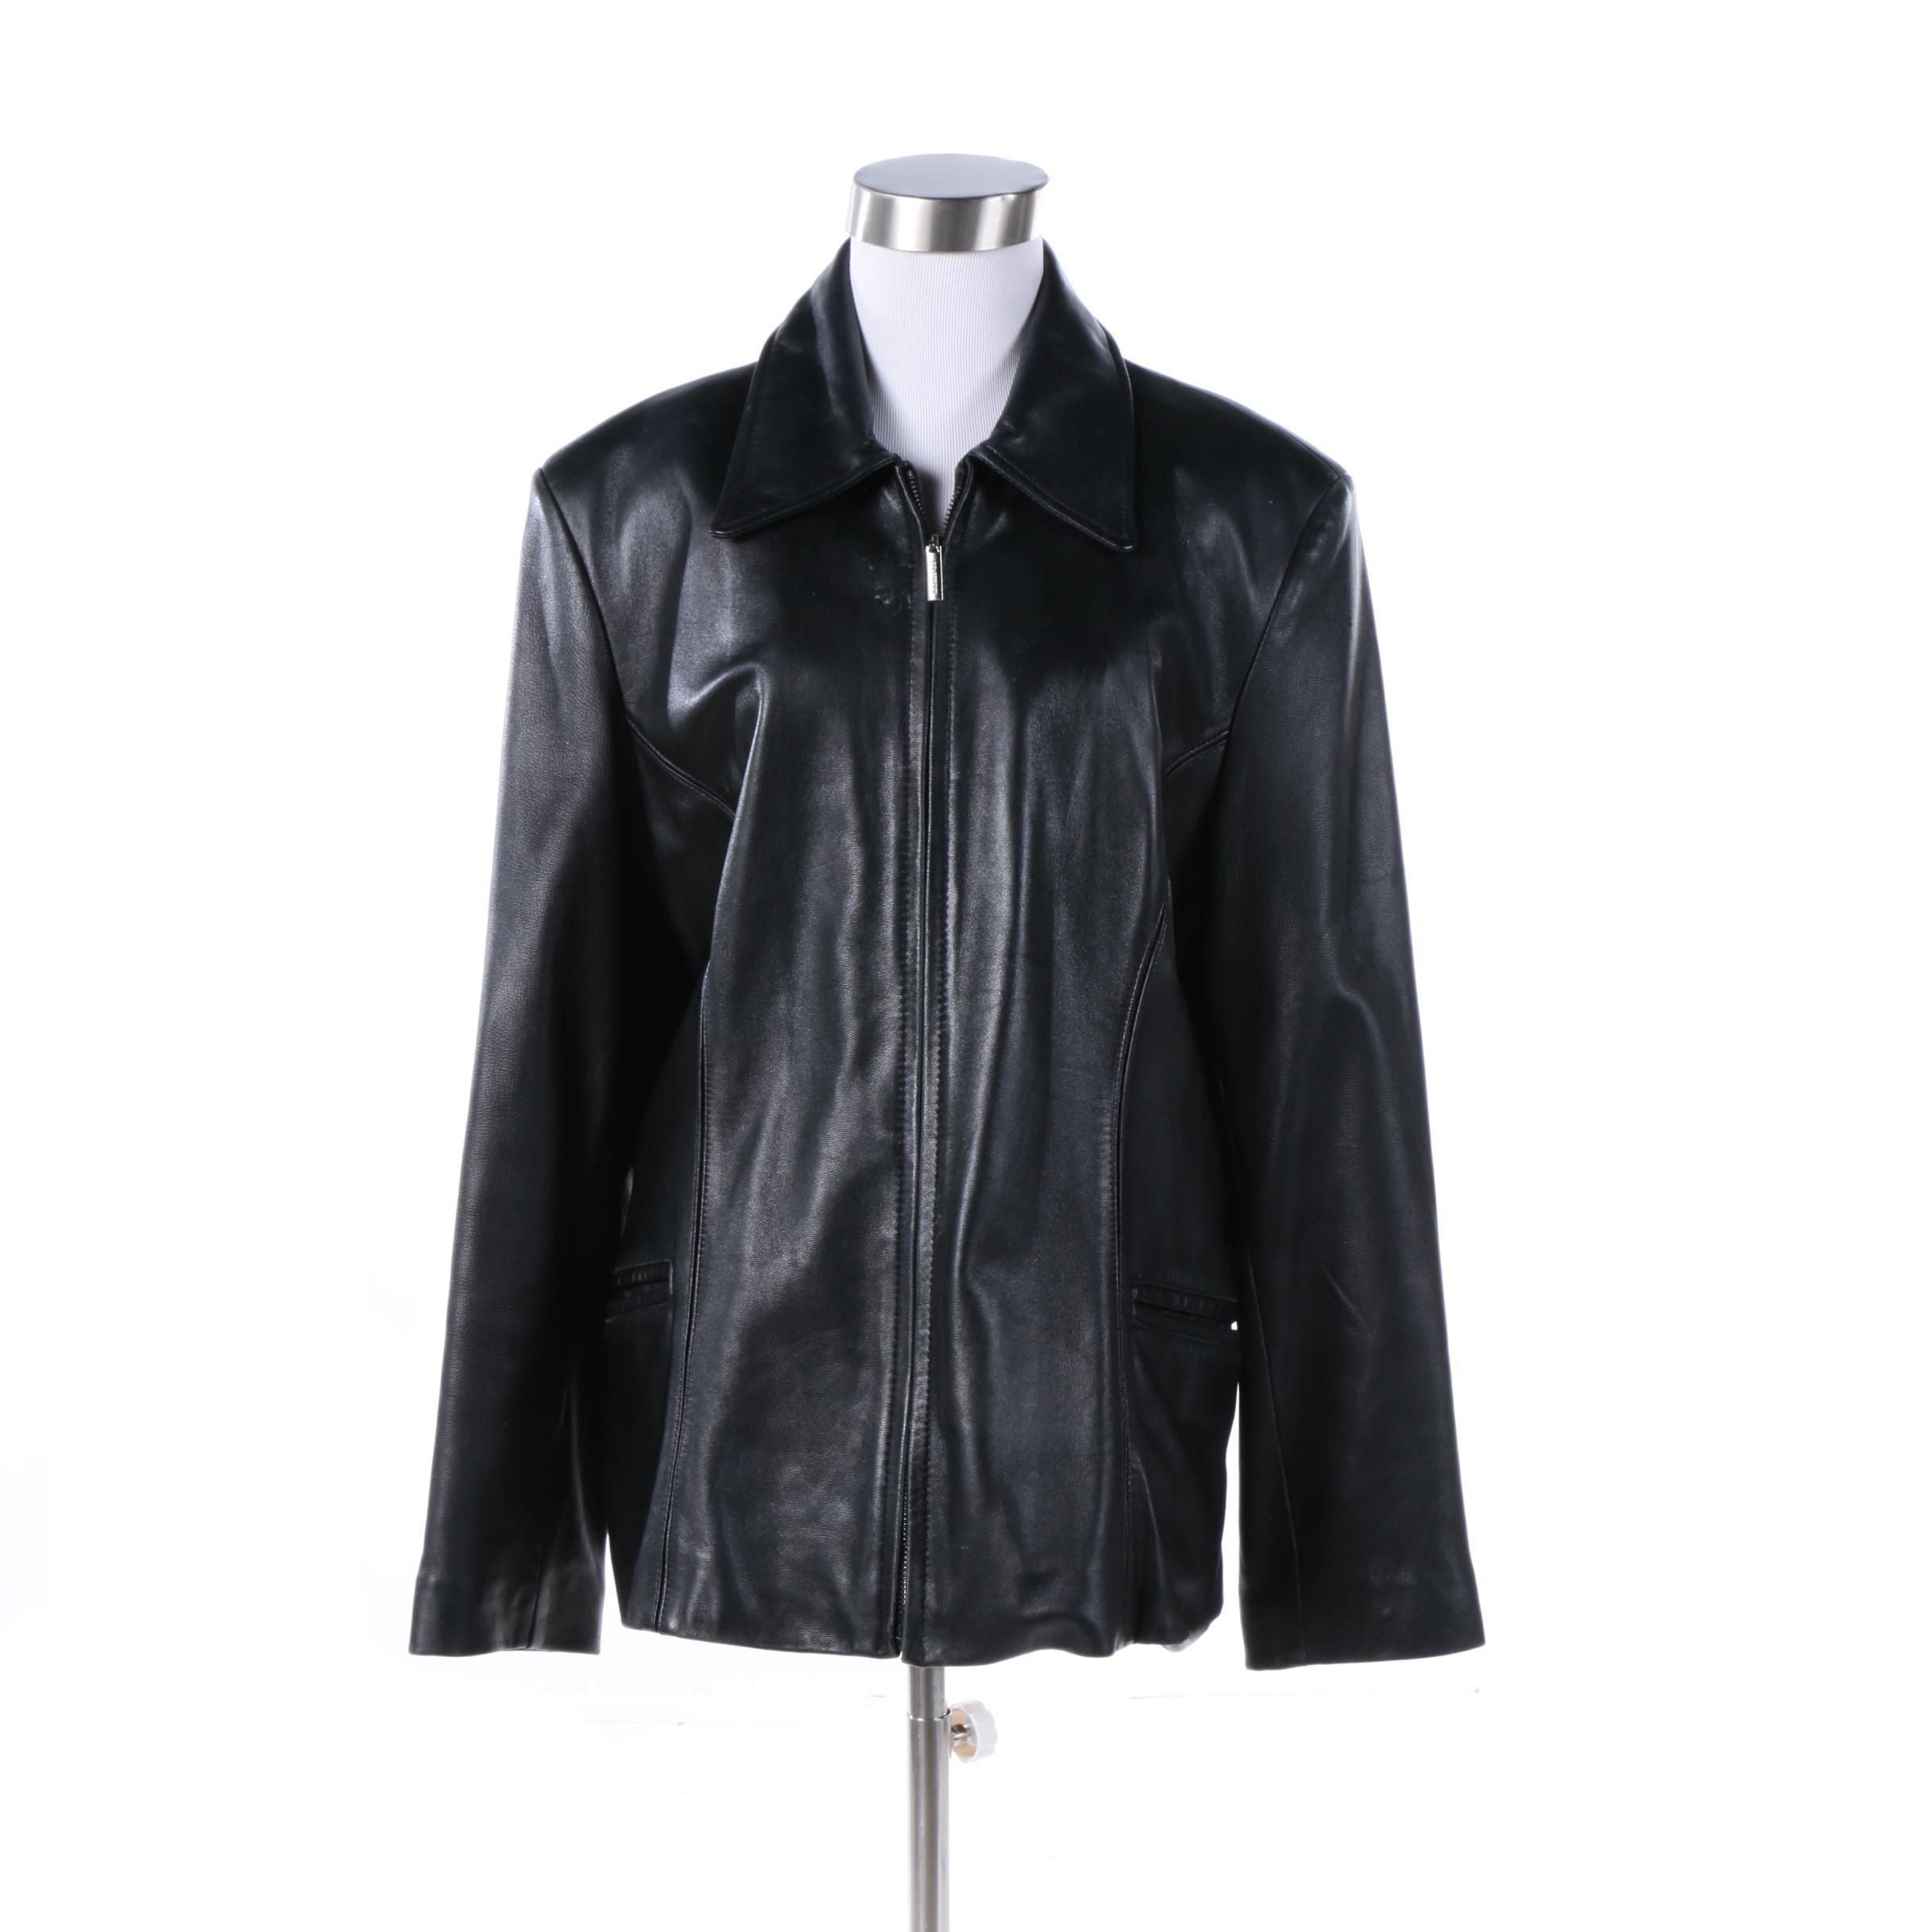 Women's Colebrook & Co. Black Leather Jacket